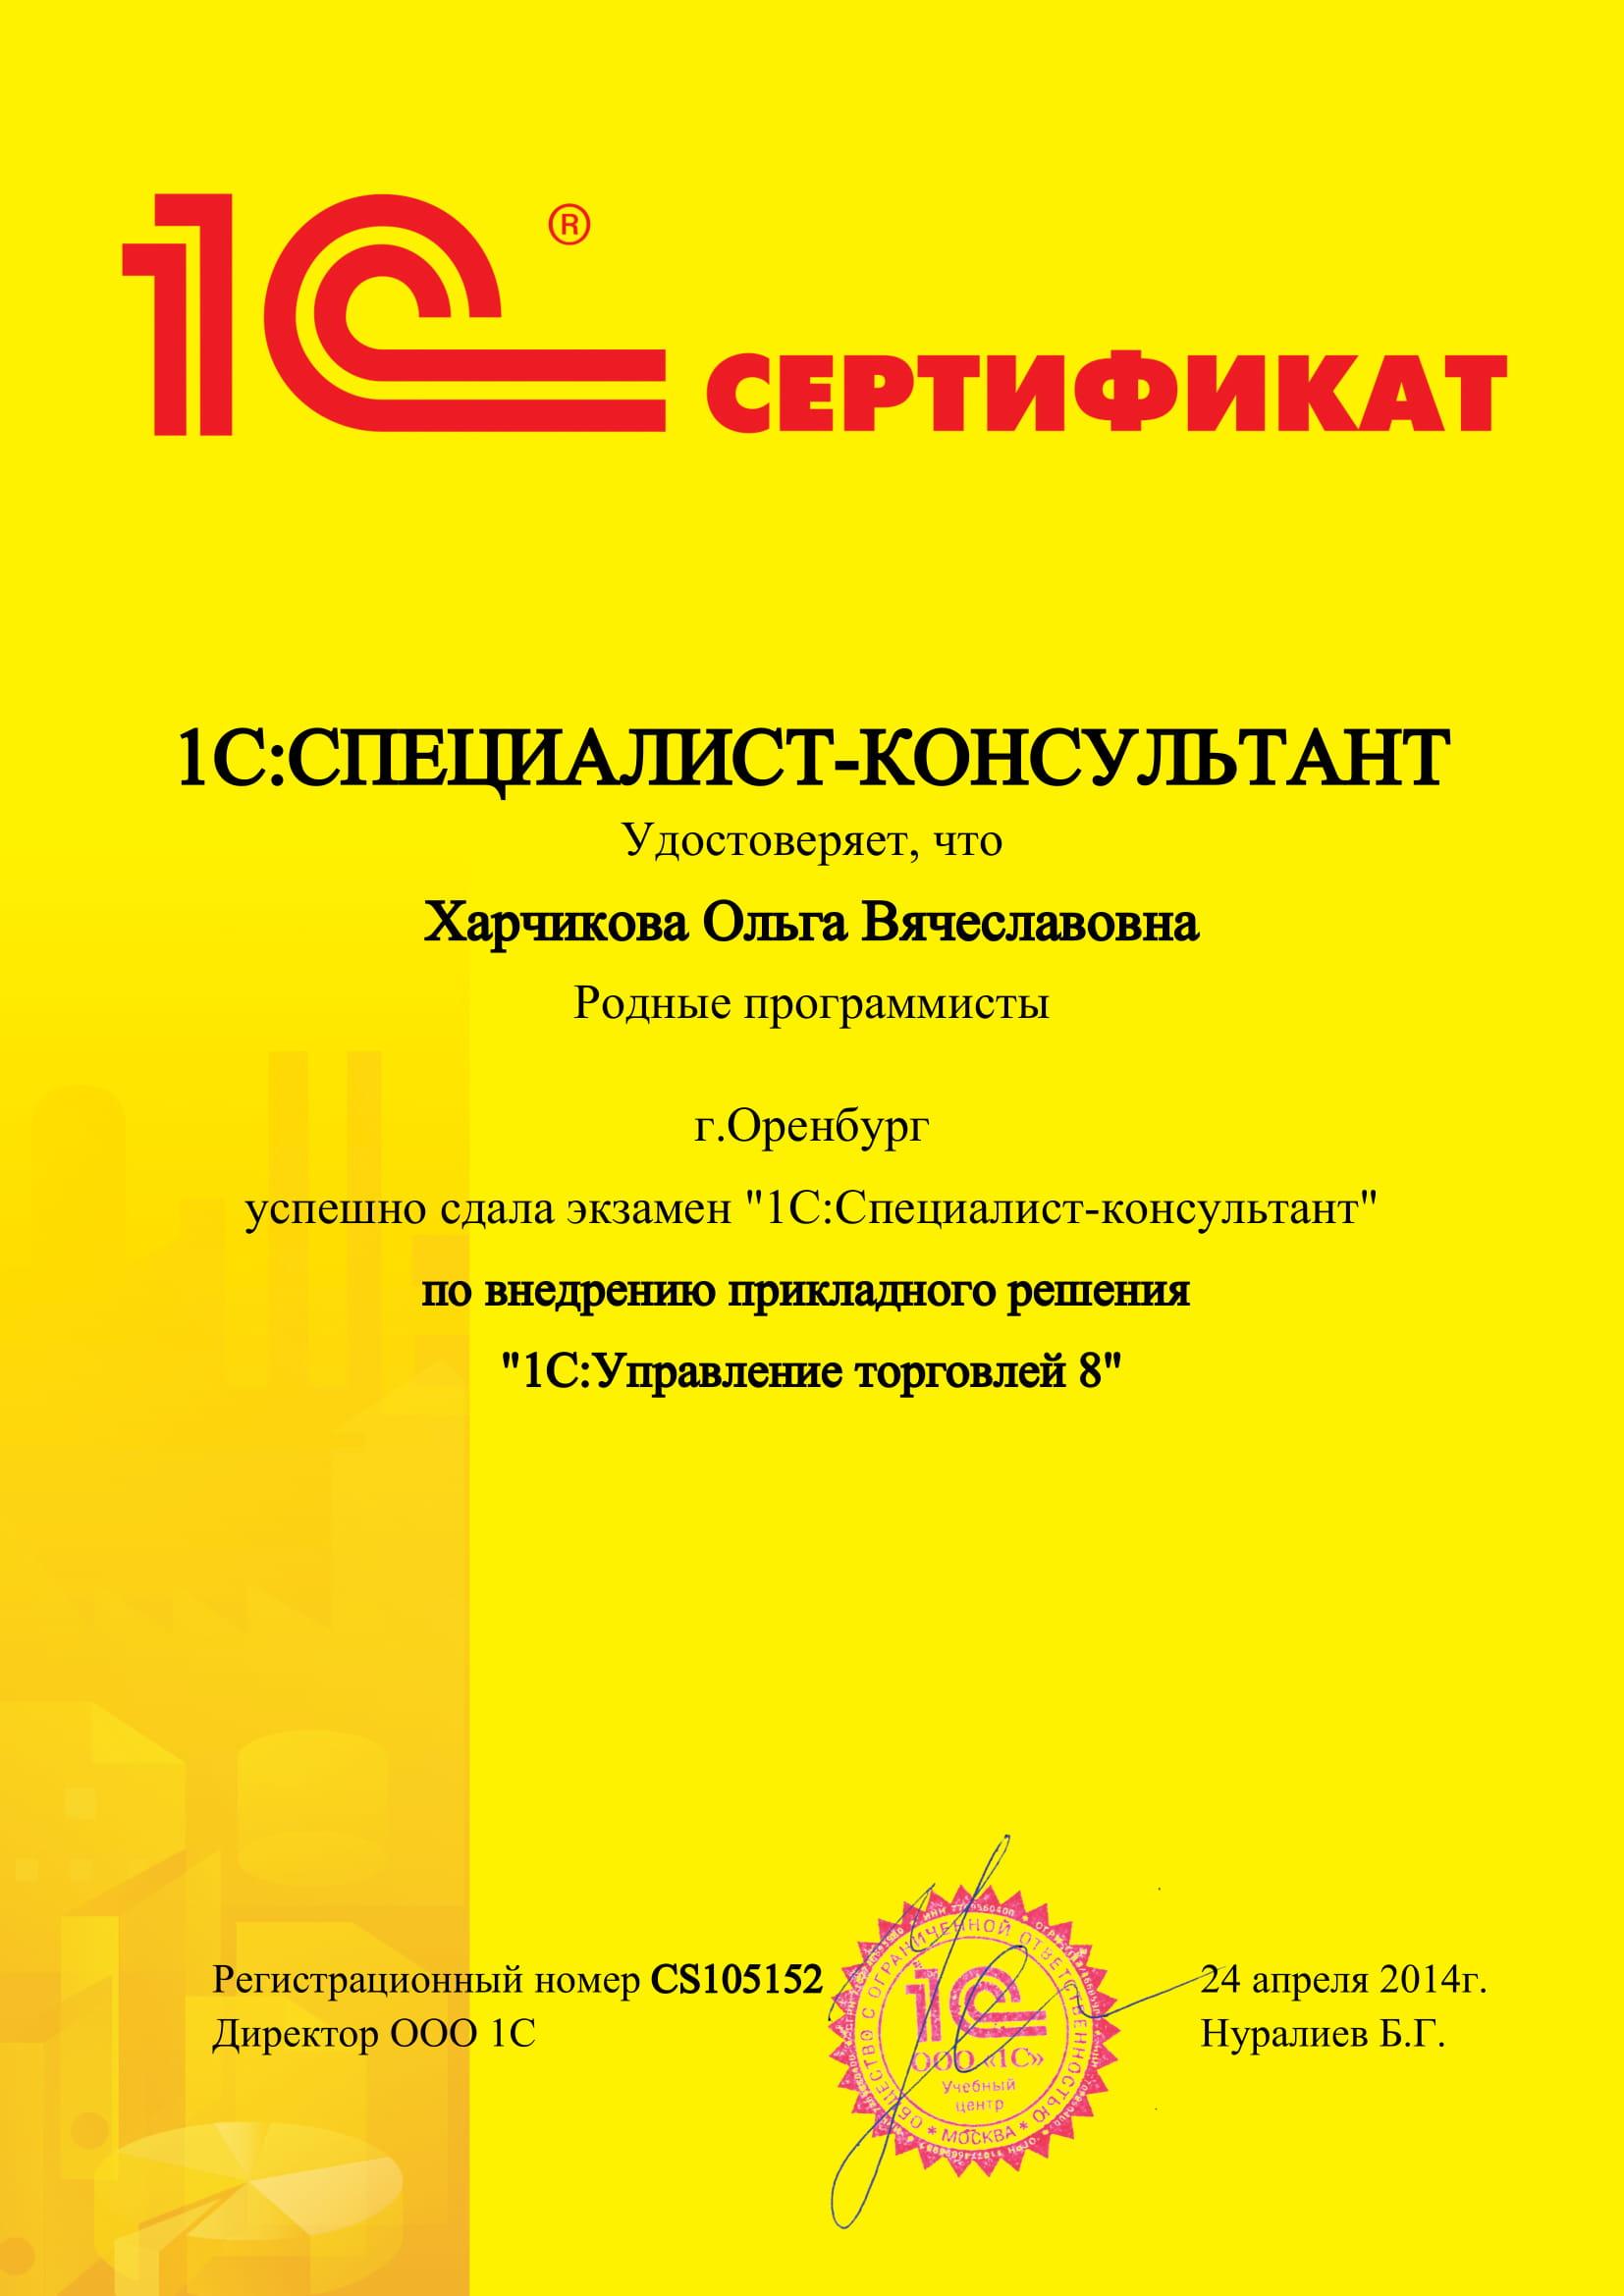 Харчикова Ольга специалист консультант УТ-1